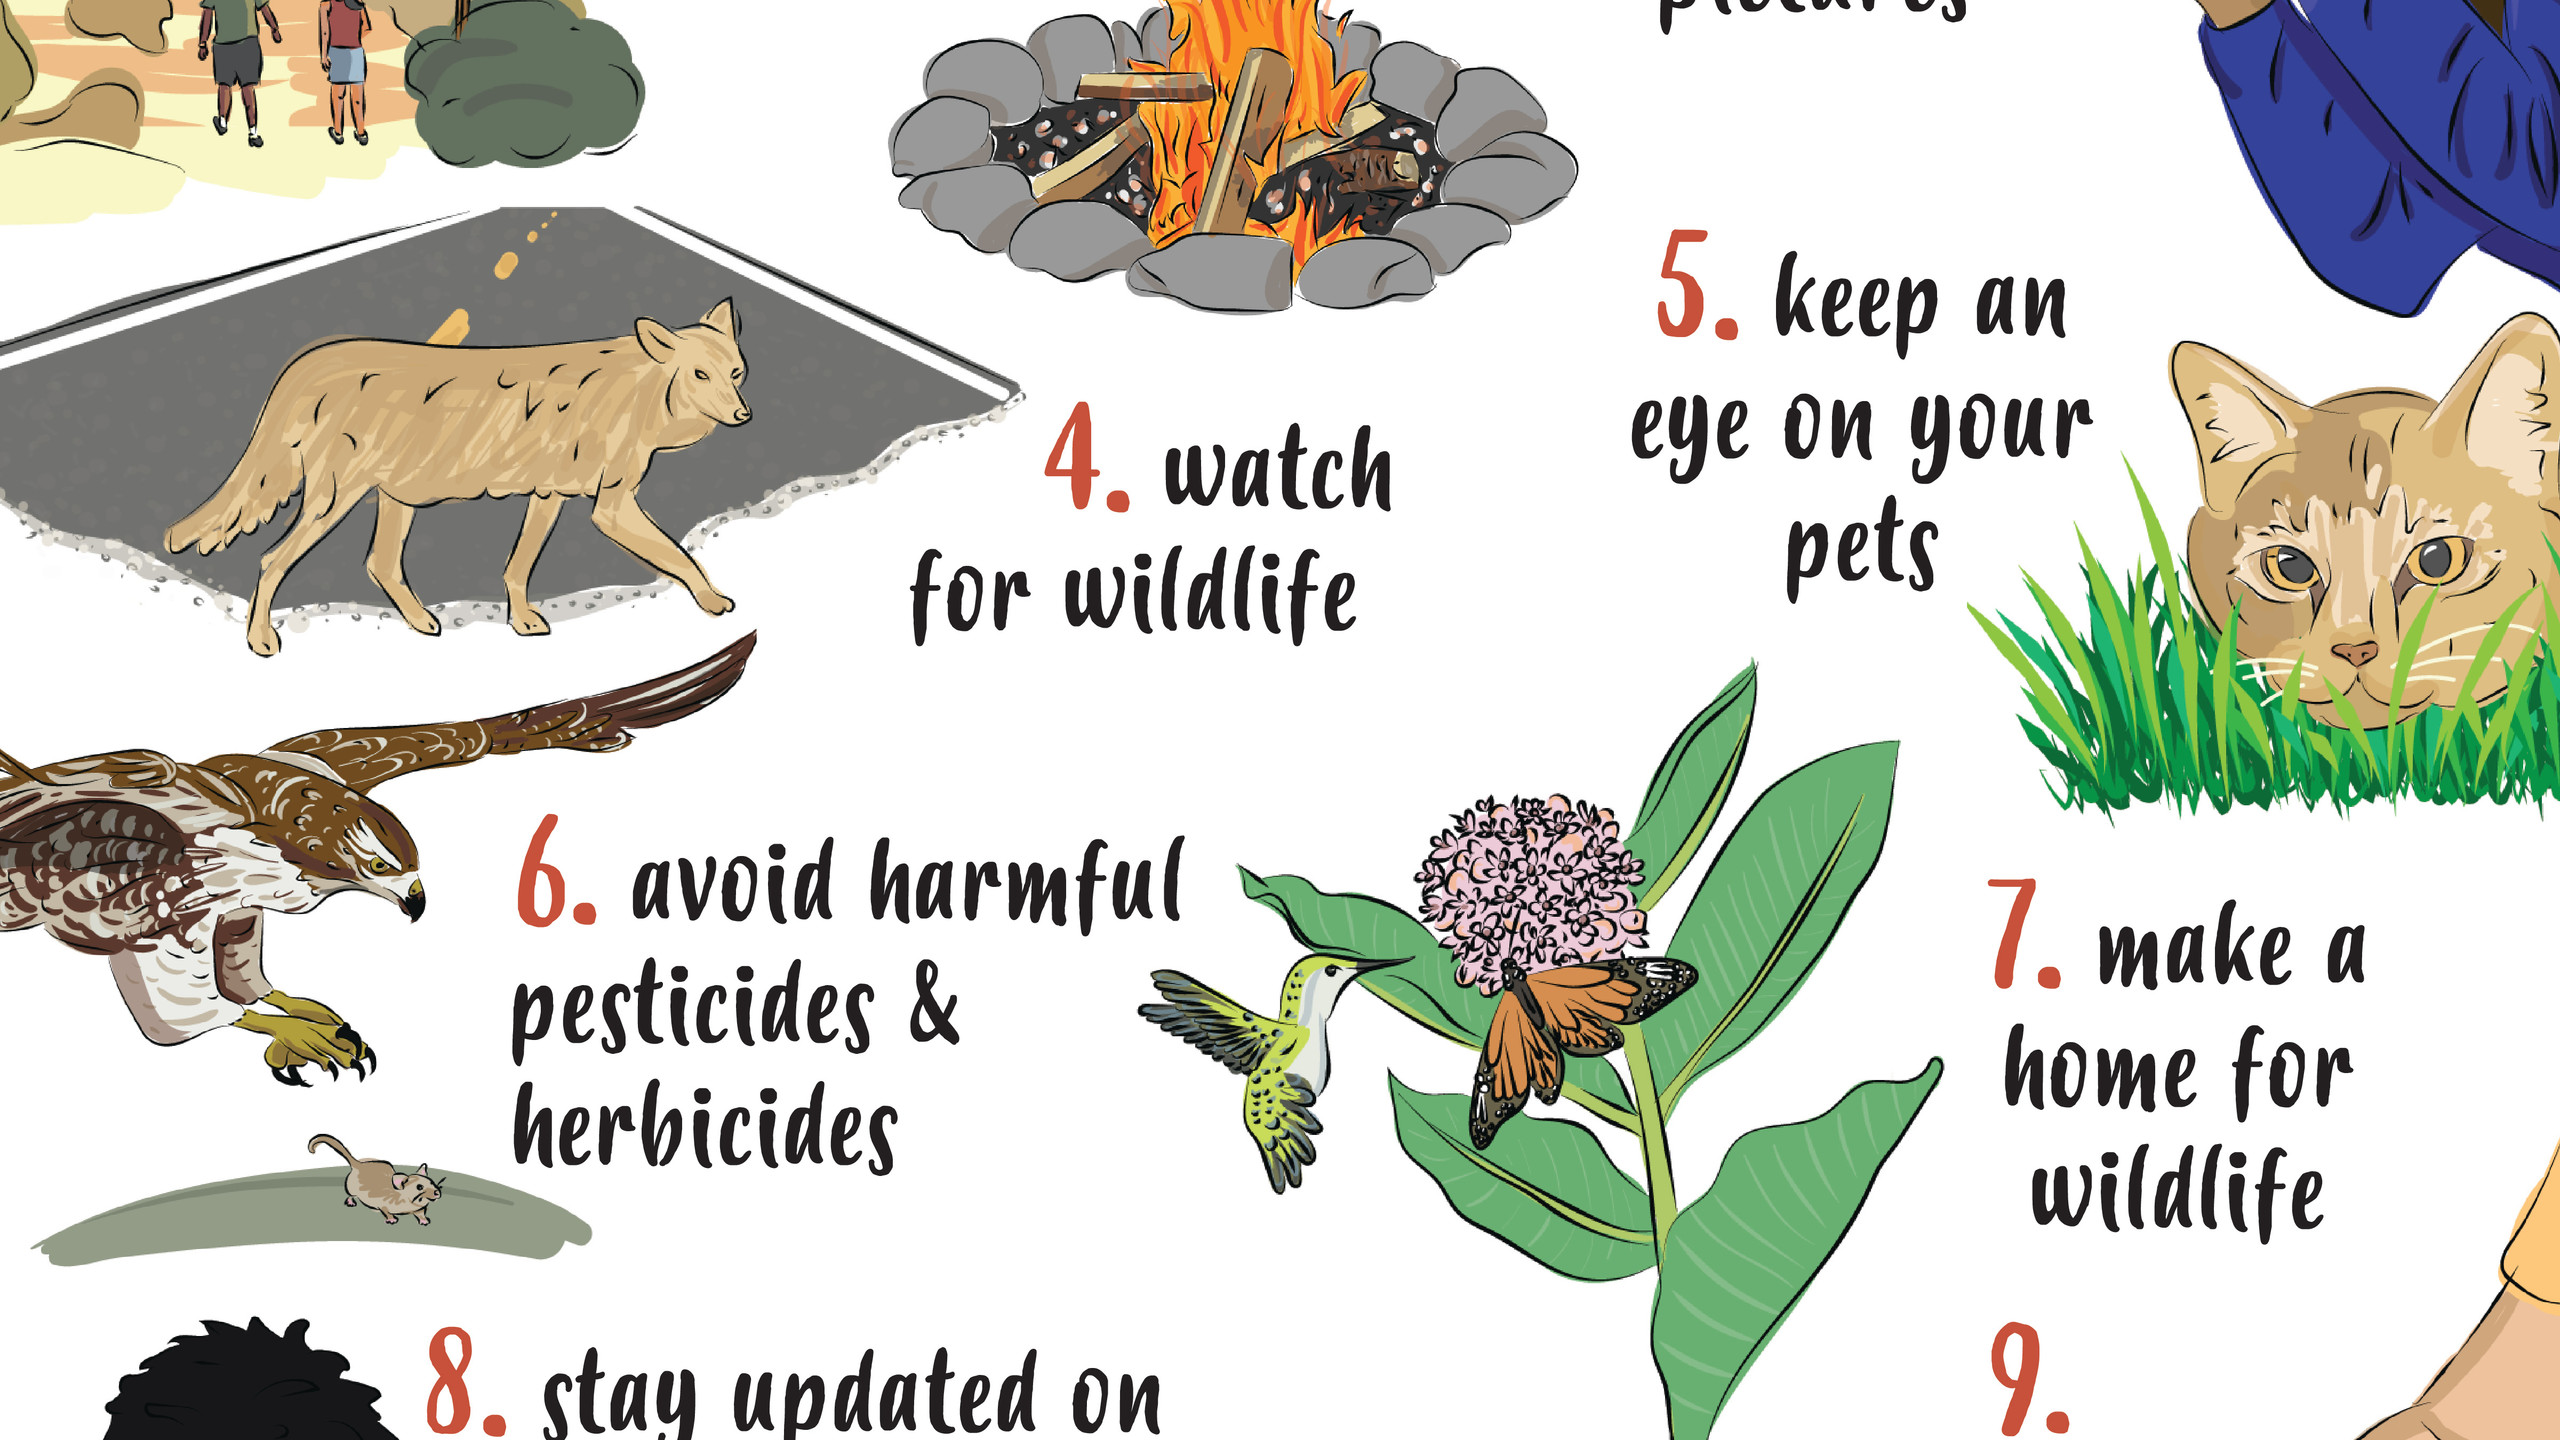 10 Things Wildlife Poster 2.4